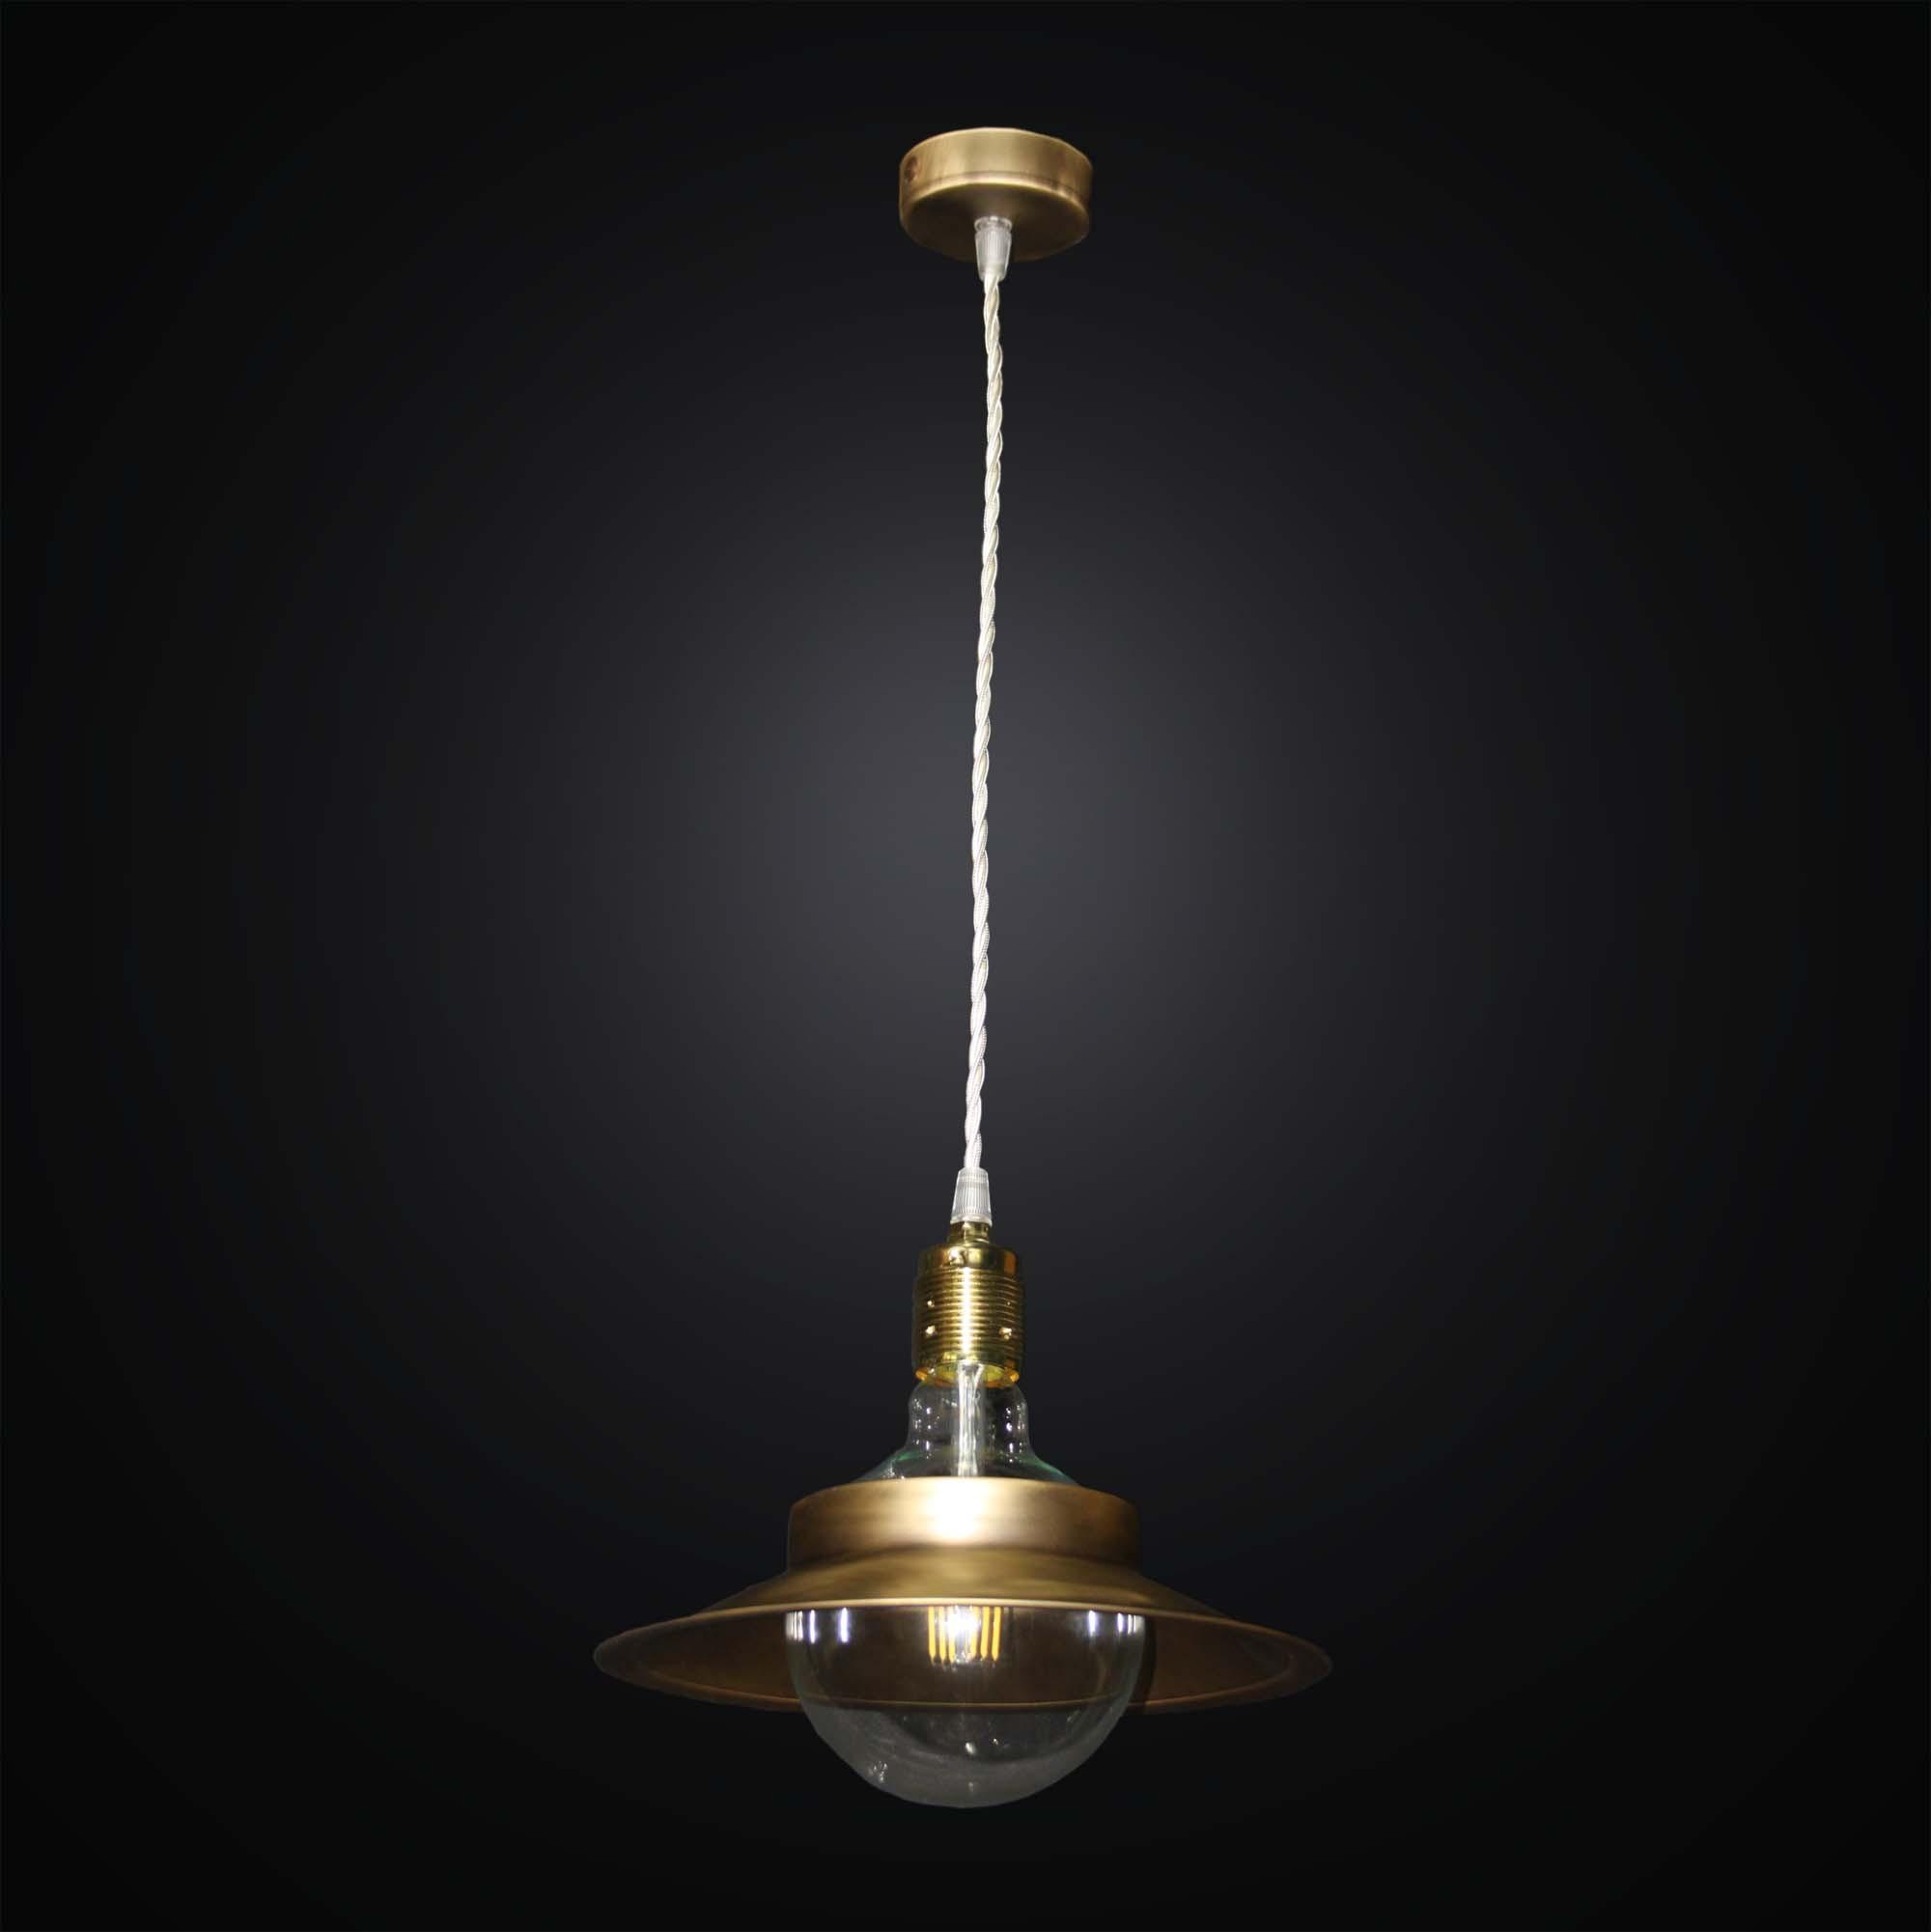 Luce Sospensione Design.Lampadario A Sospensione Design Rustico 1 Luce Bga 2813 S25 Ottone